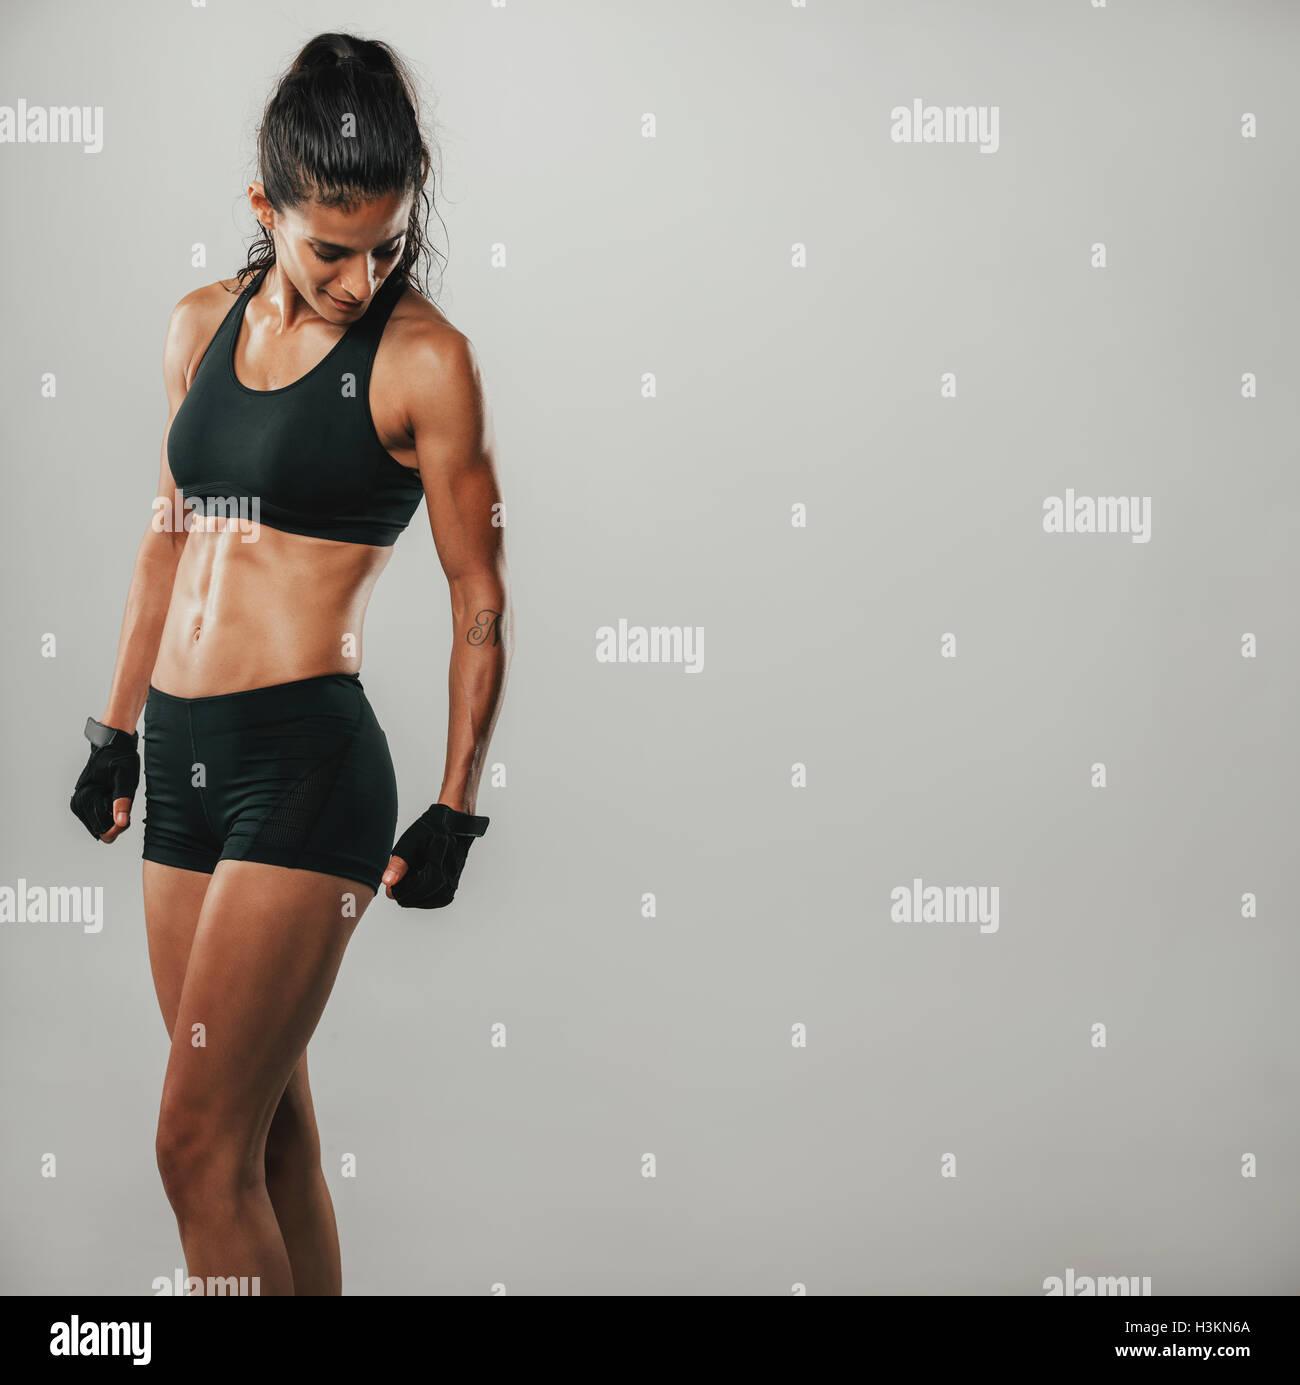 Schwarze reife muskulöse Frauen